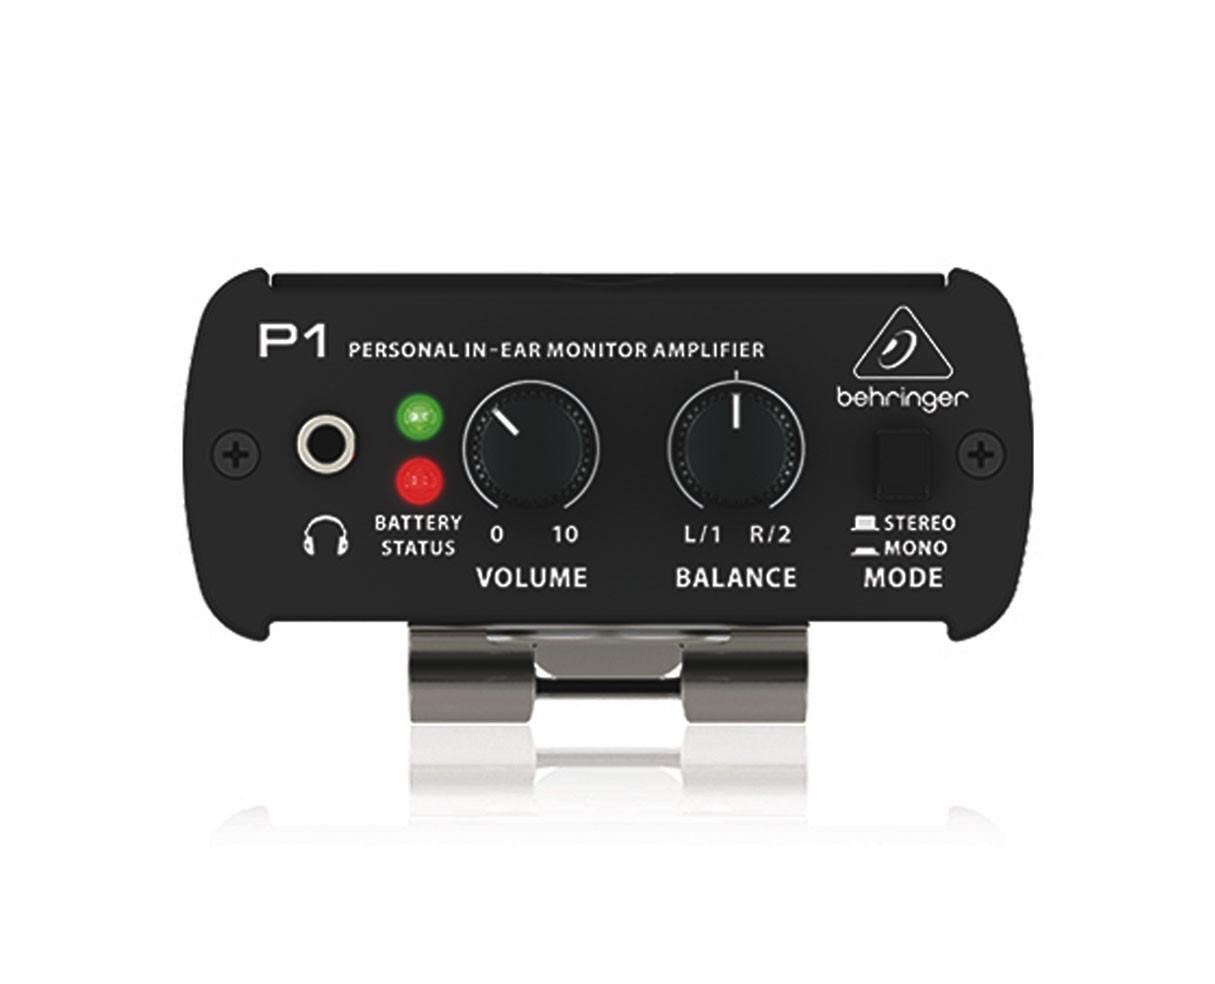 Behringer P1 Personal In Ear Monitor amplifier